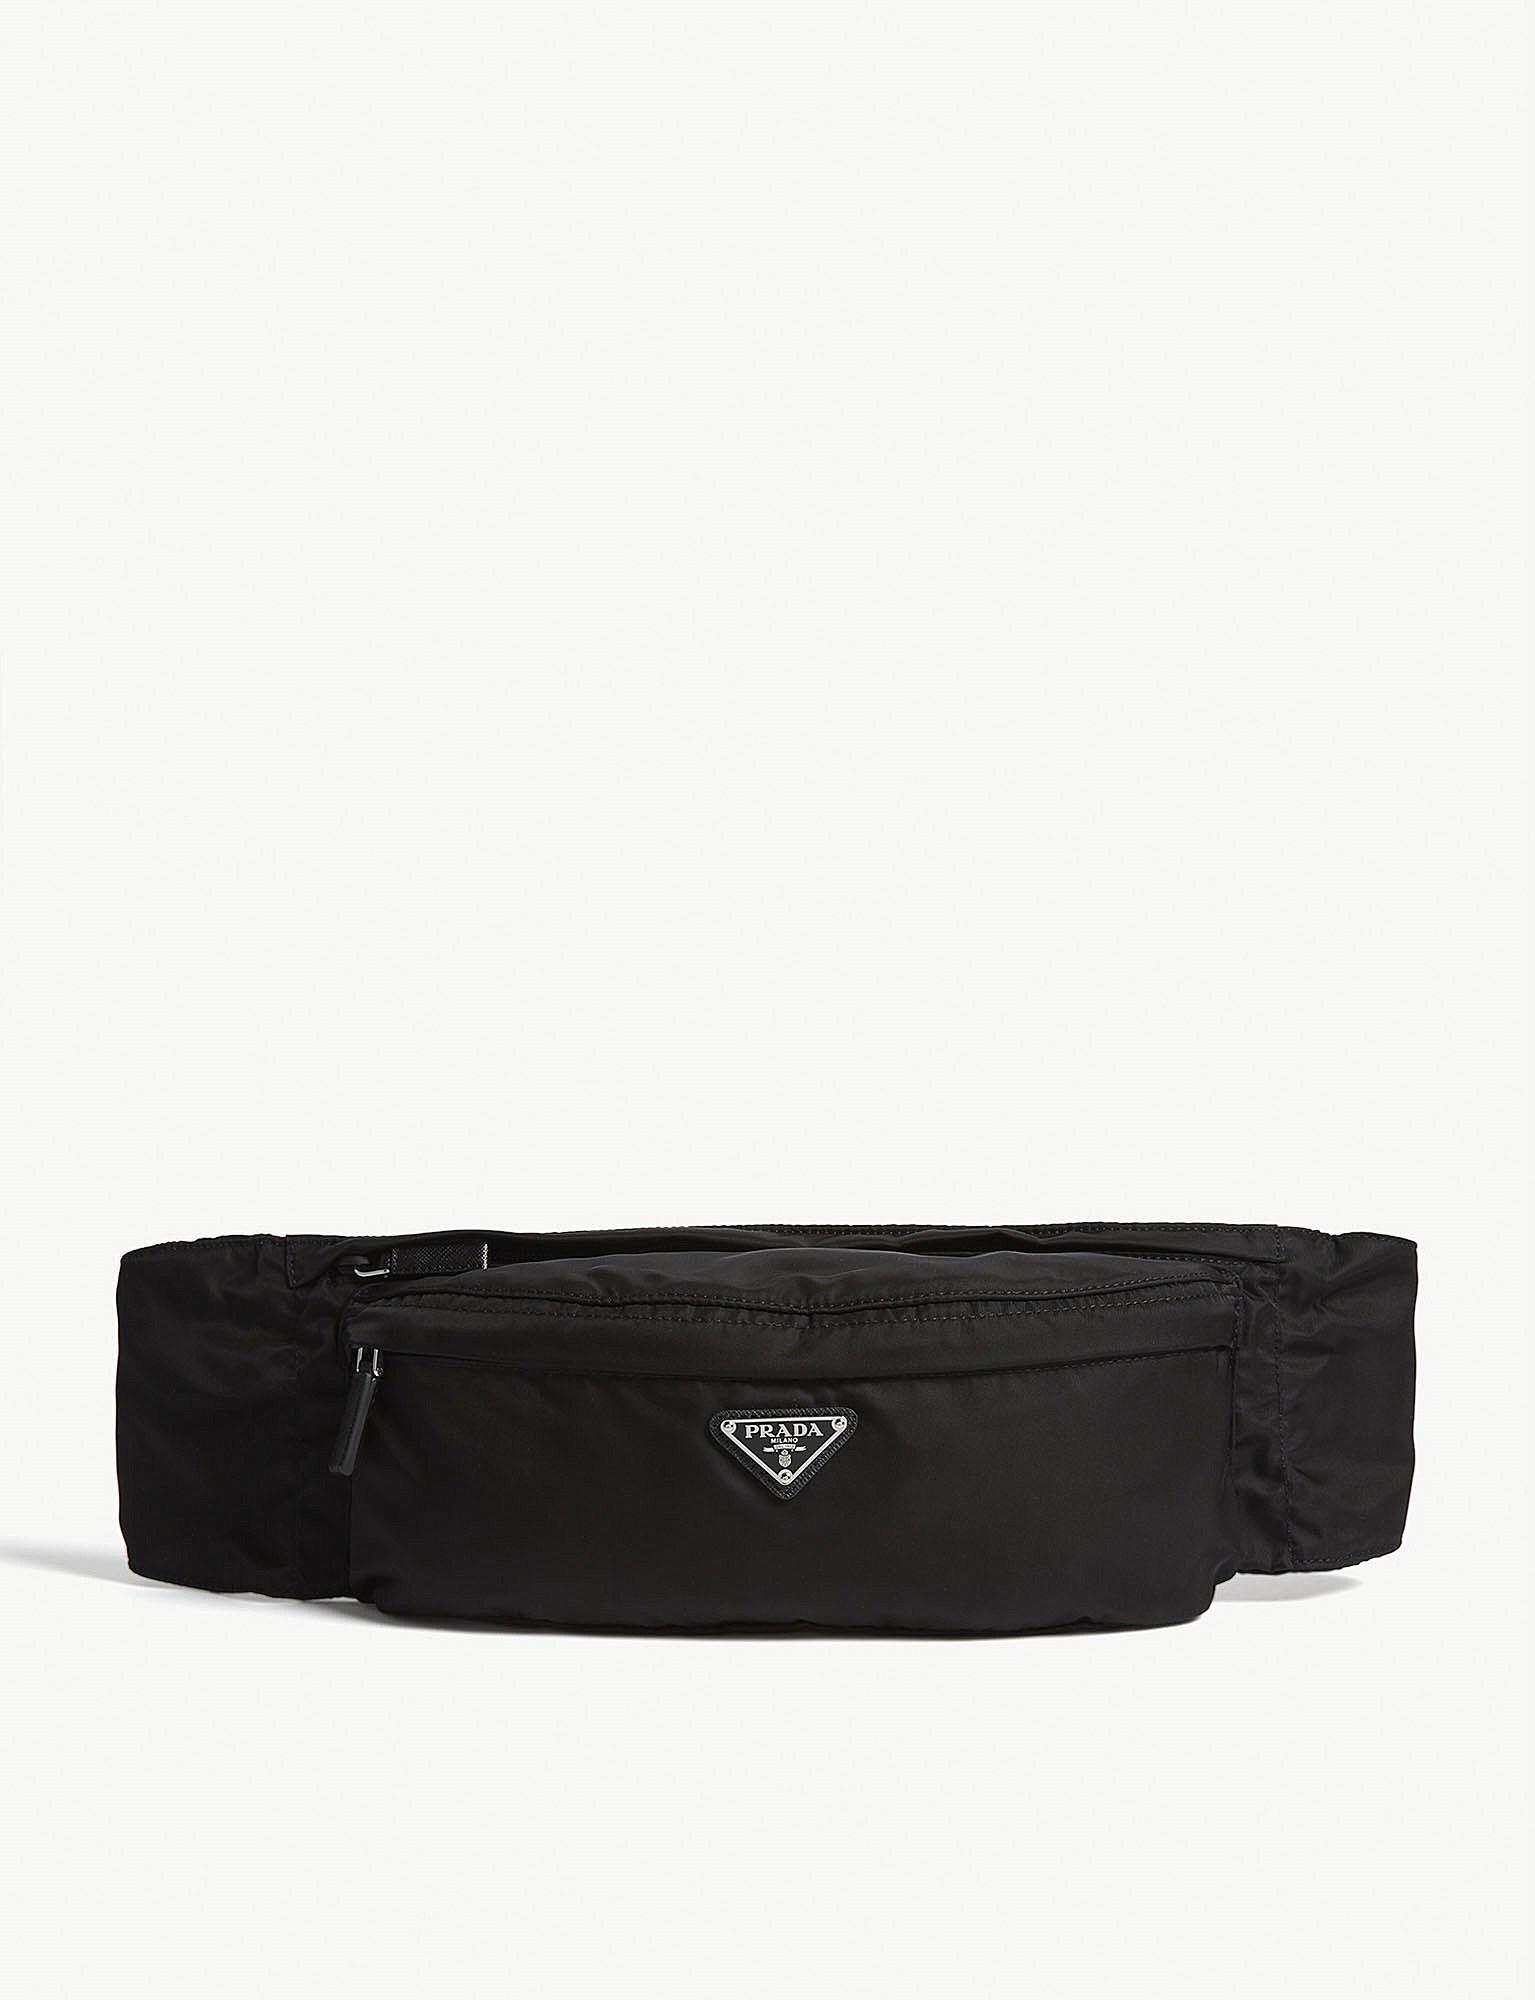 37f56974ca83 Lyst - Prada Logo Nylon Belt Bag in Black